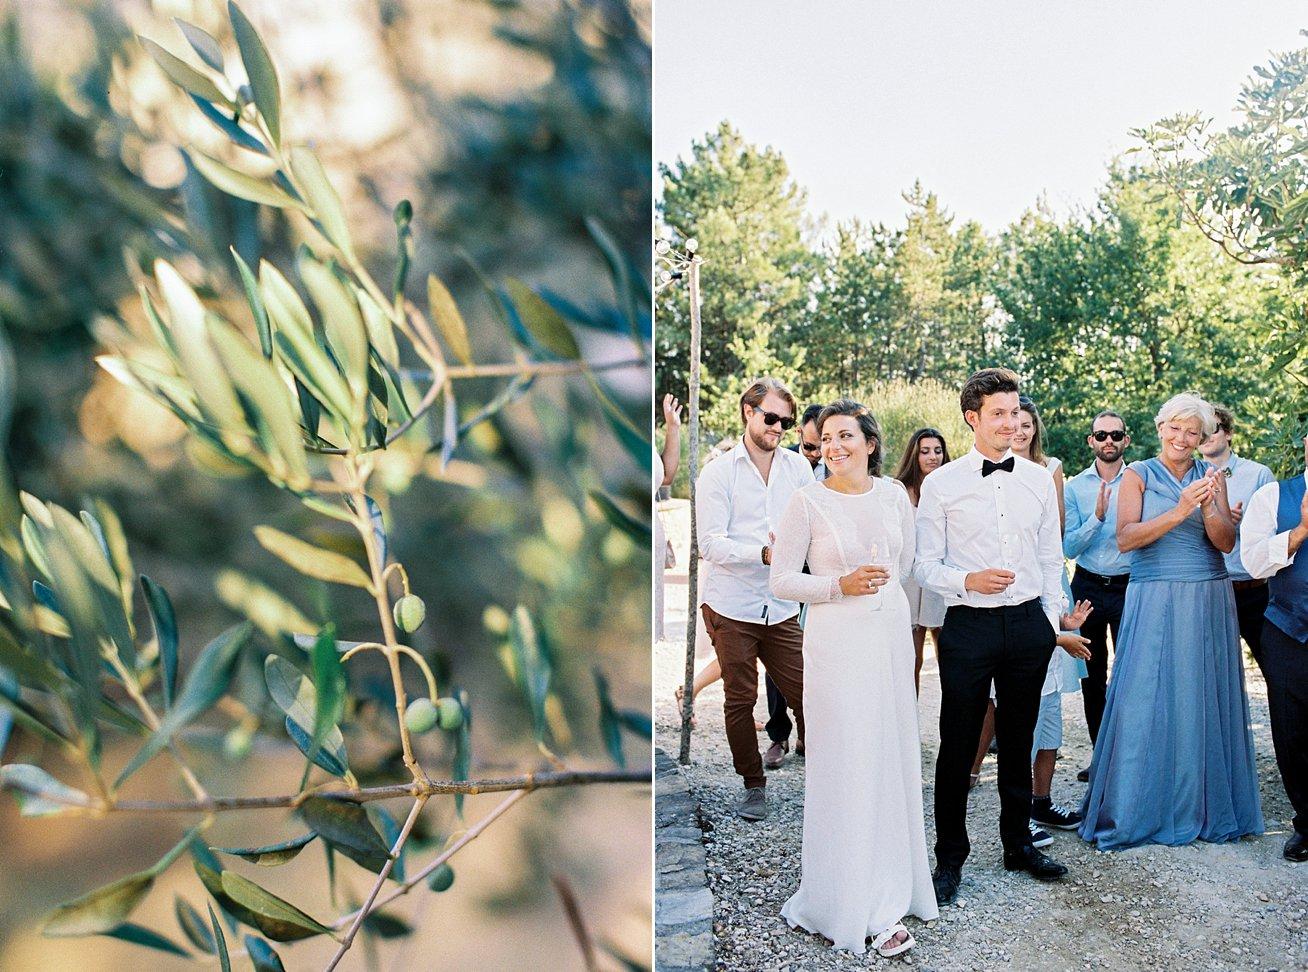 Amanda-Drost-Fotografie-Bruioft-Italie-Trouwen-buitenland-destination-wedding-italy_0105.jpg